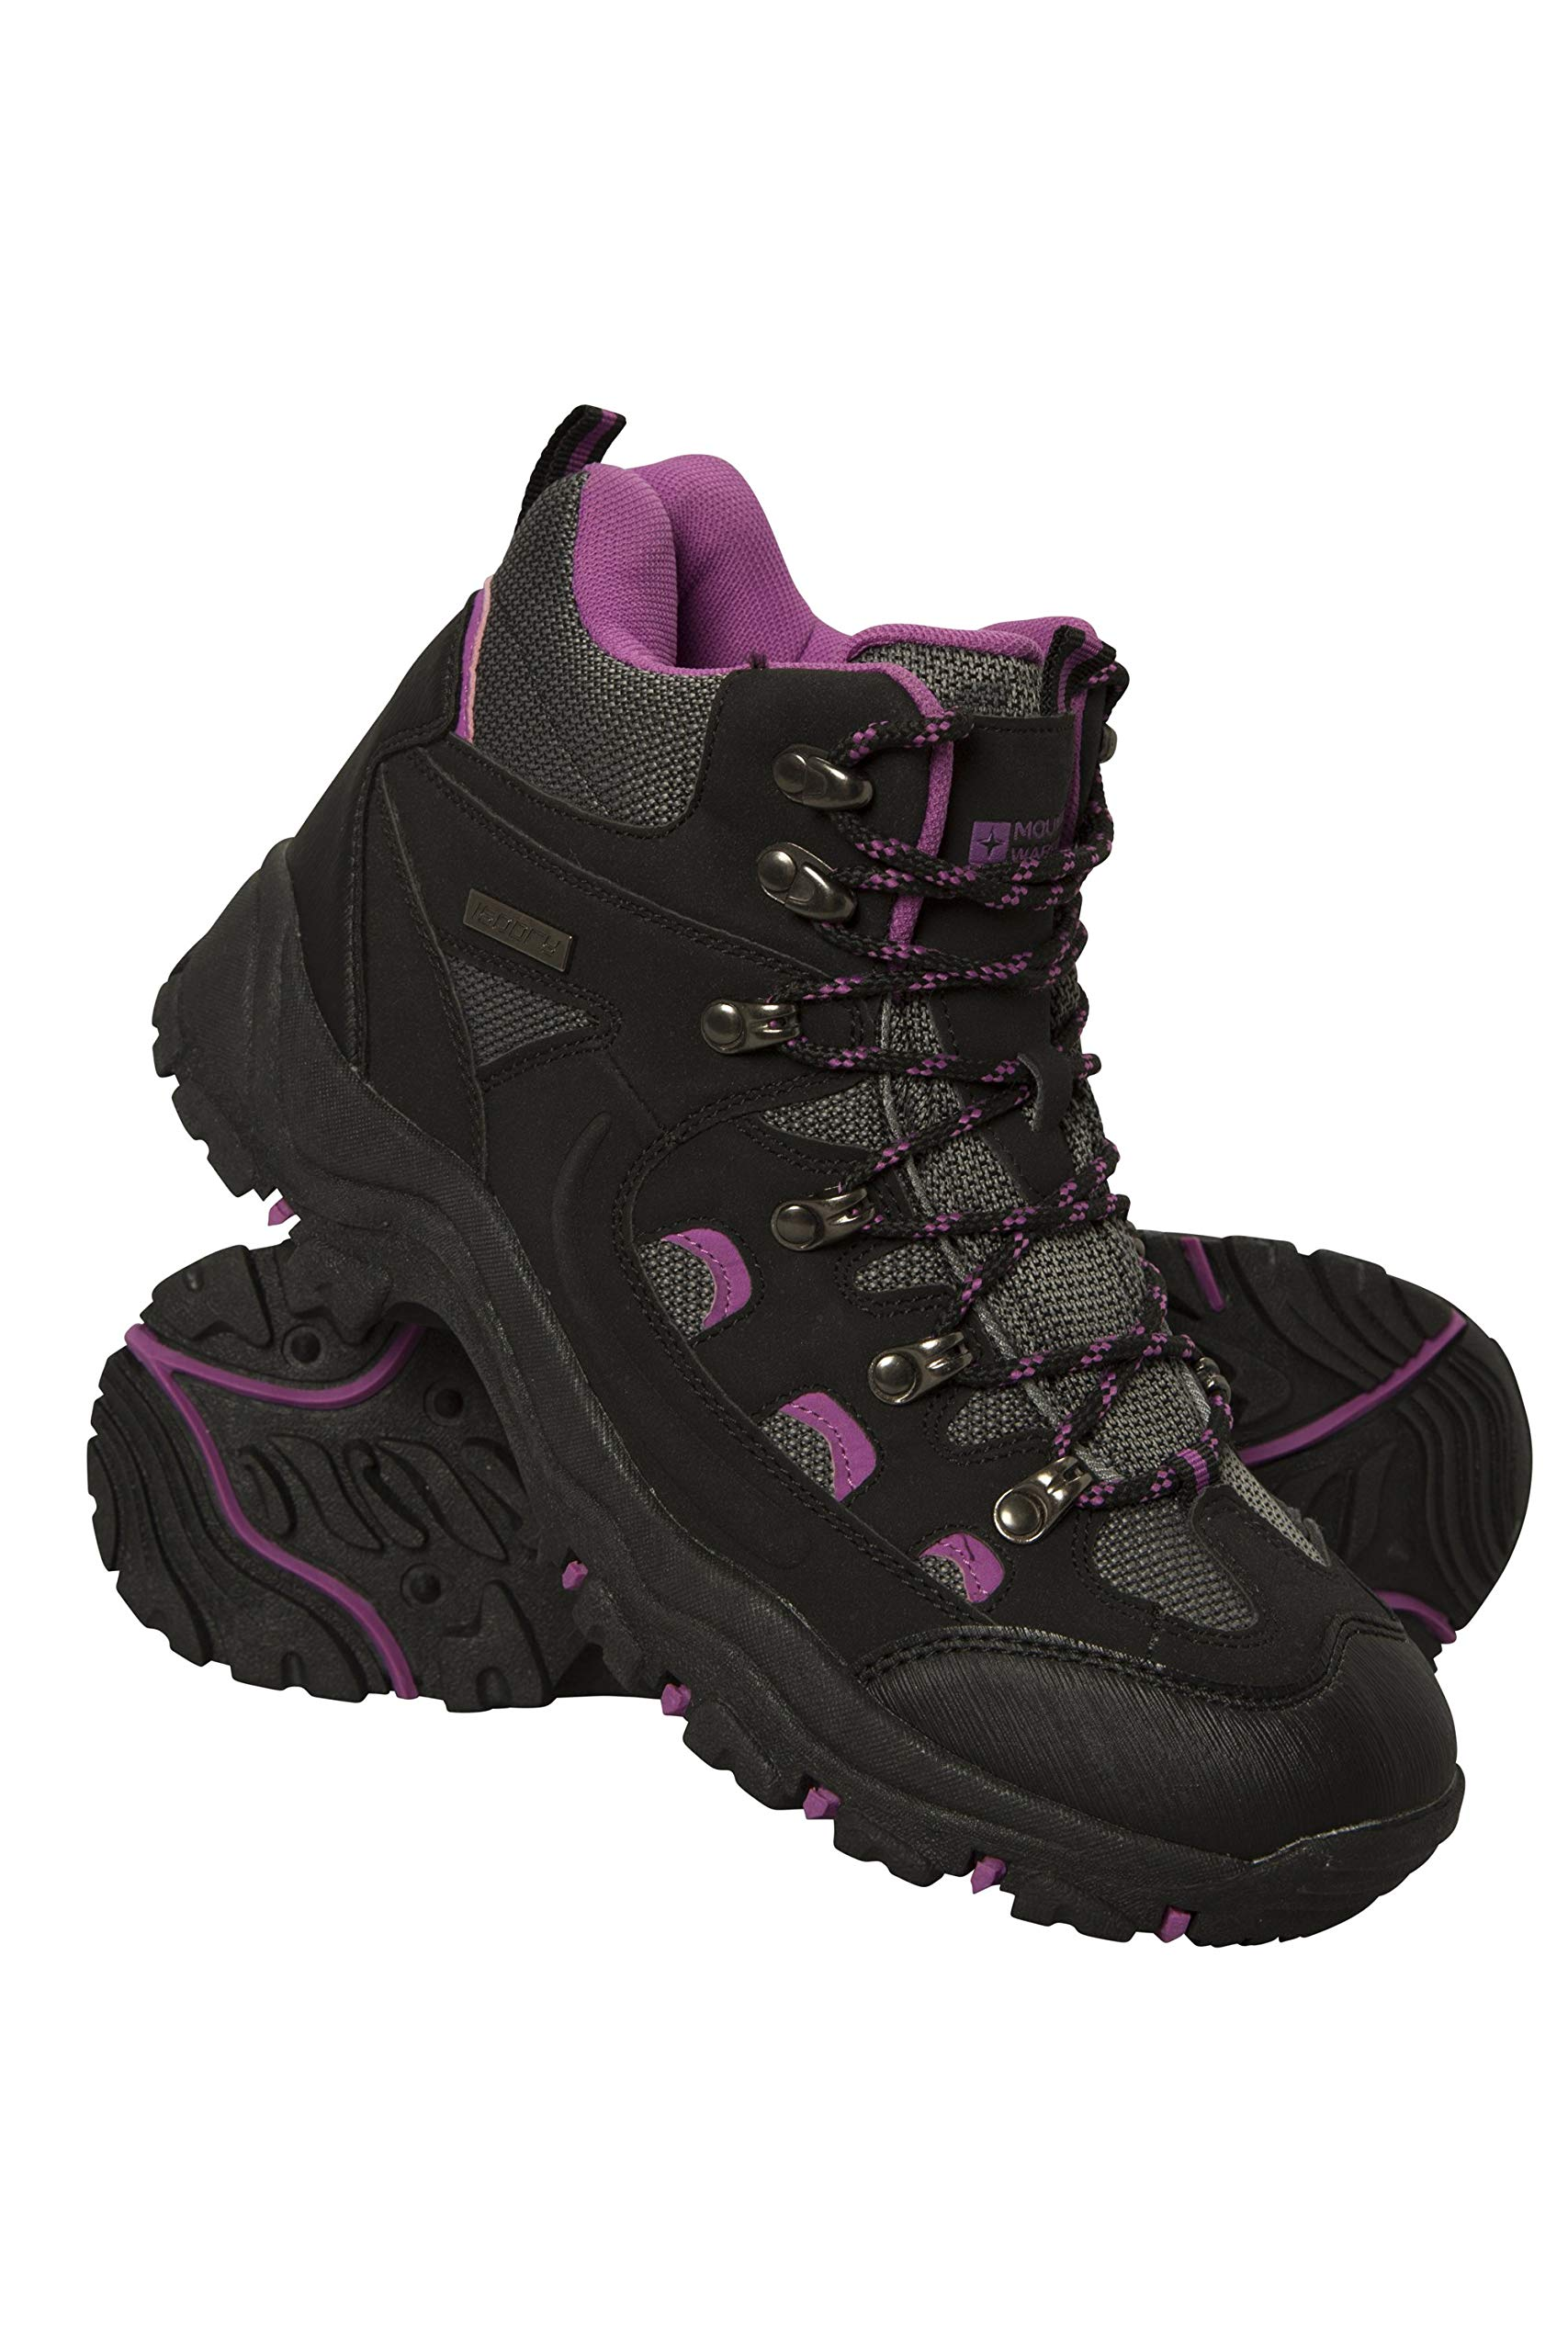 Mountain Warehouse Adventurer Womens Waterproof Boots - for Hiking Black Womens Shoe Size 8 US by Mountain Warehouse